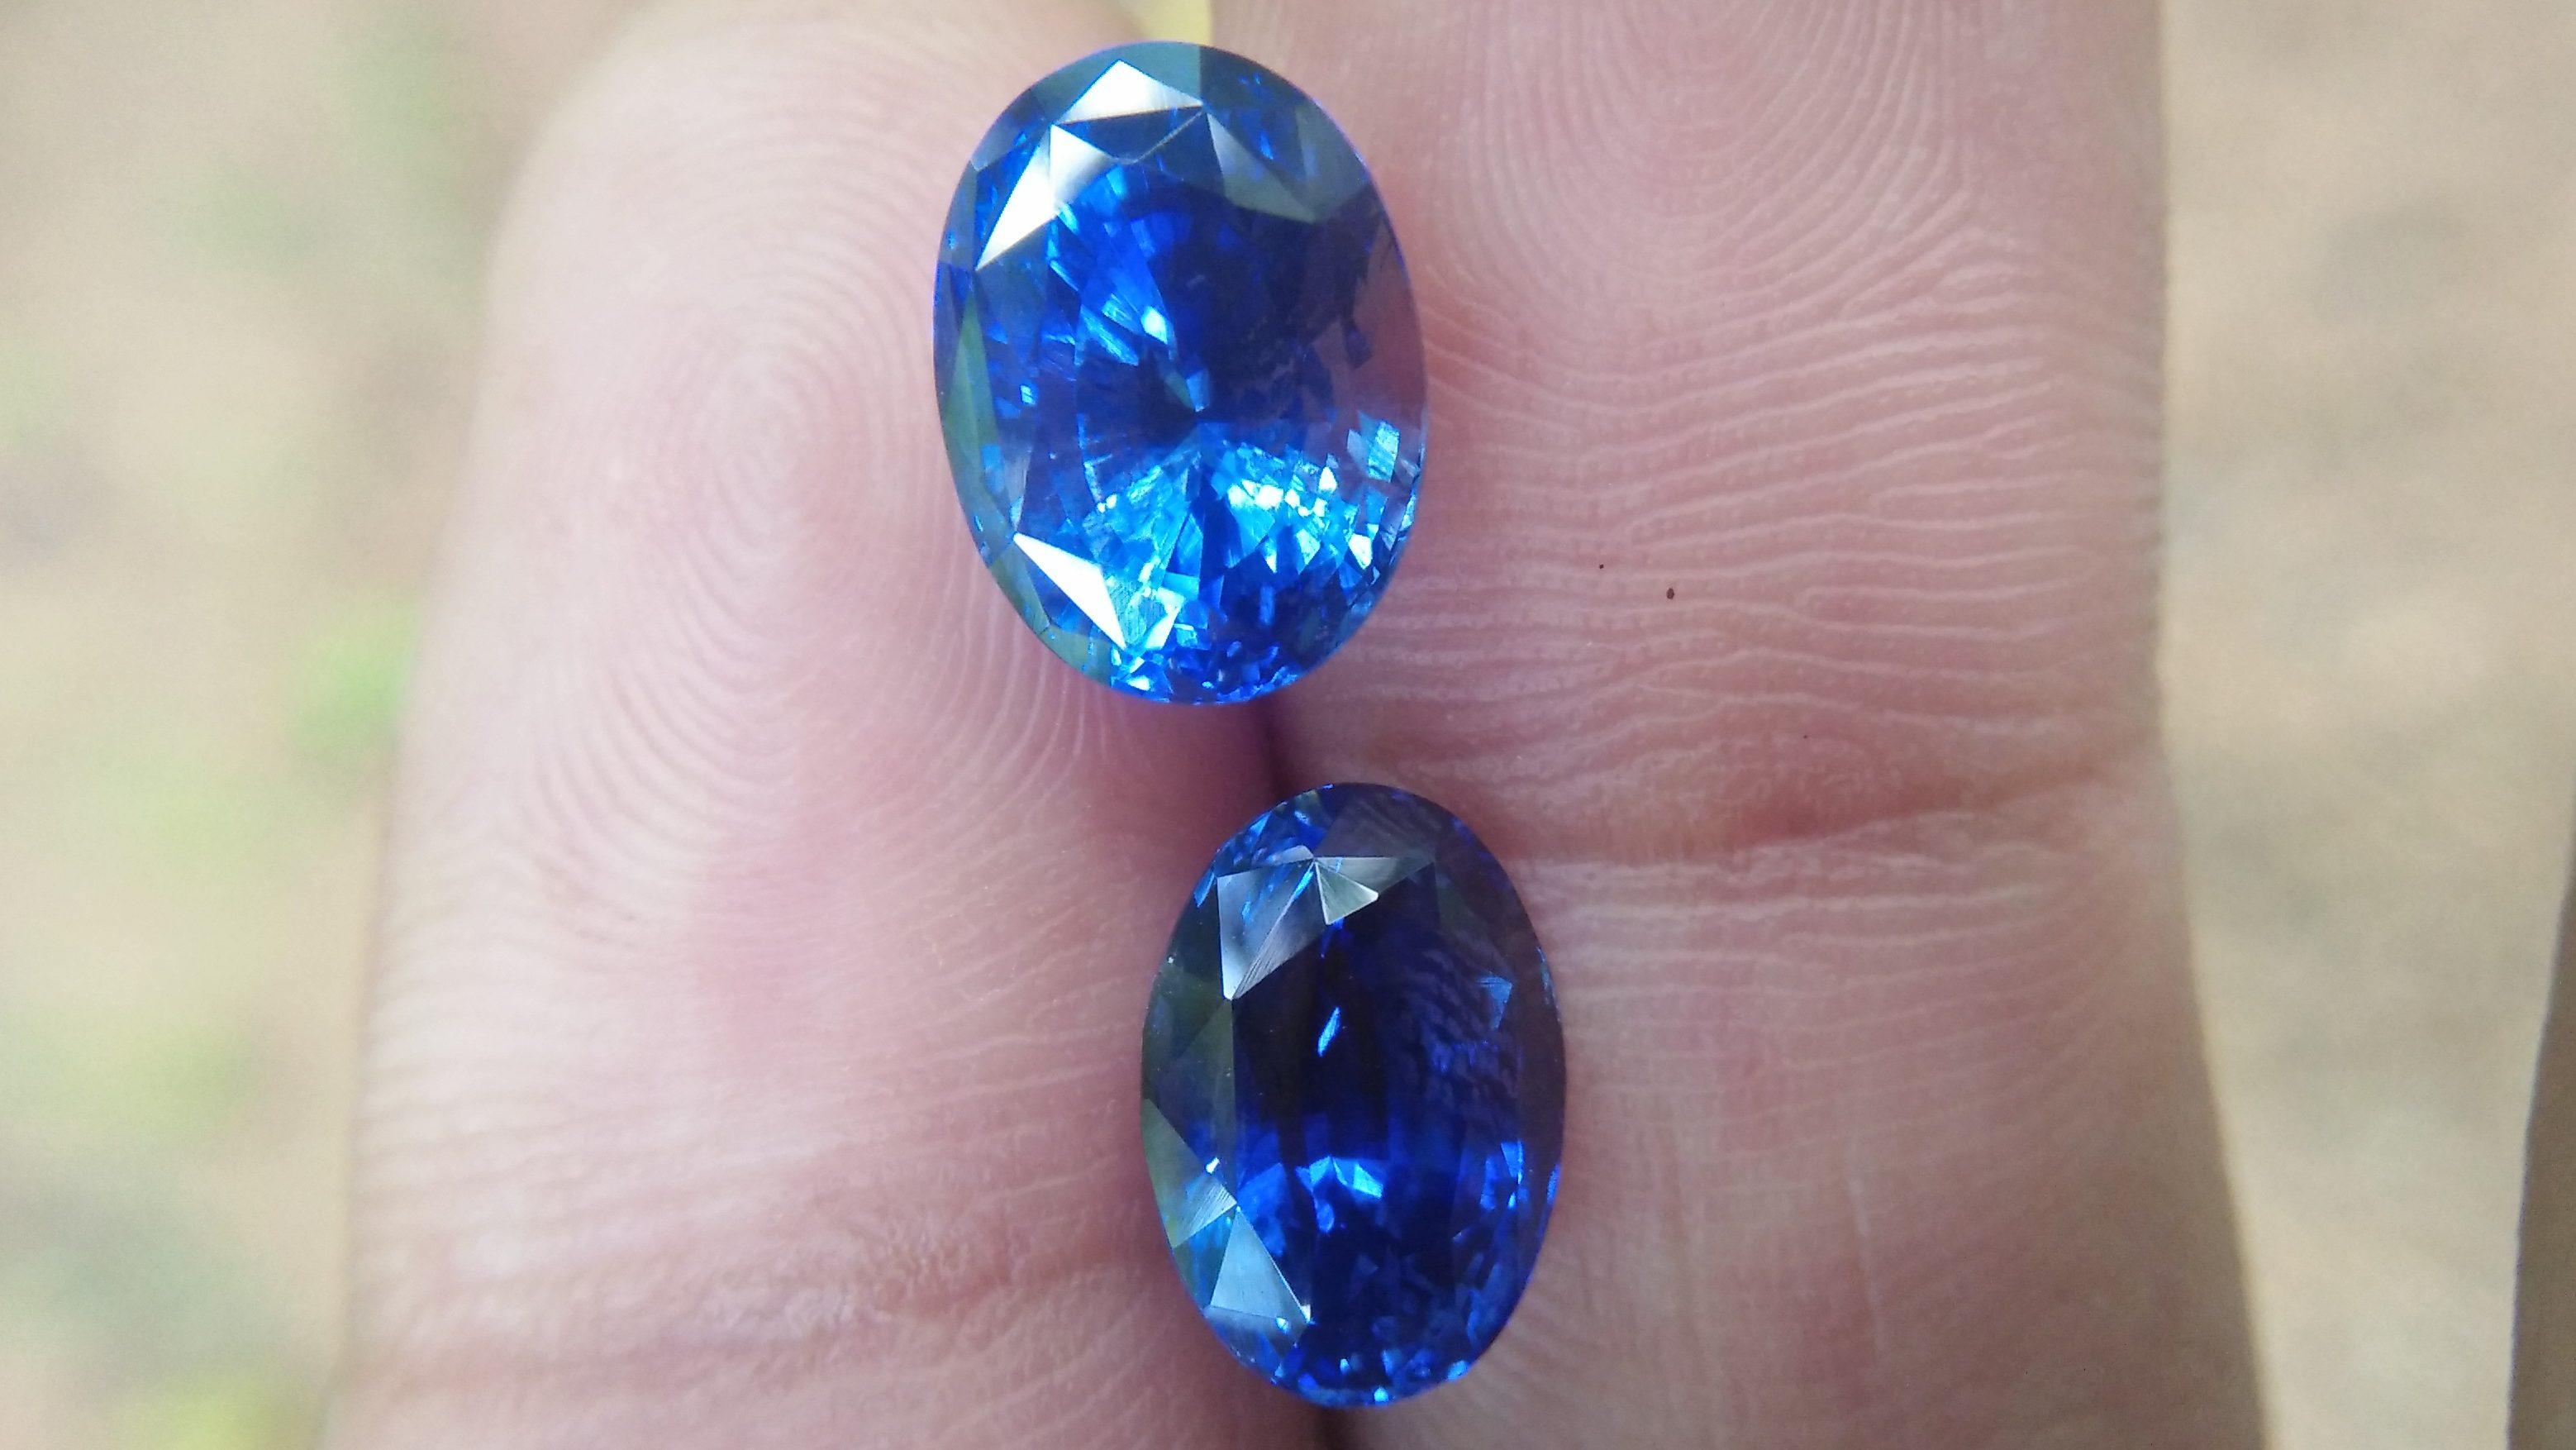 Ceylon Natural Blue Sapphire Heated Couple Dimension : 7.50mm x 10mm x 6.6mm / 7mm x 9.8mm x 5.5mm Weight : 4.20 Cts / 3.10Cts Shape : Ovel Colour : Blue Clarity : Clean Treatment : Heated Mineral : Ratnapura Sri Lanka